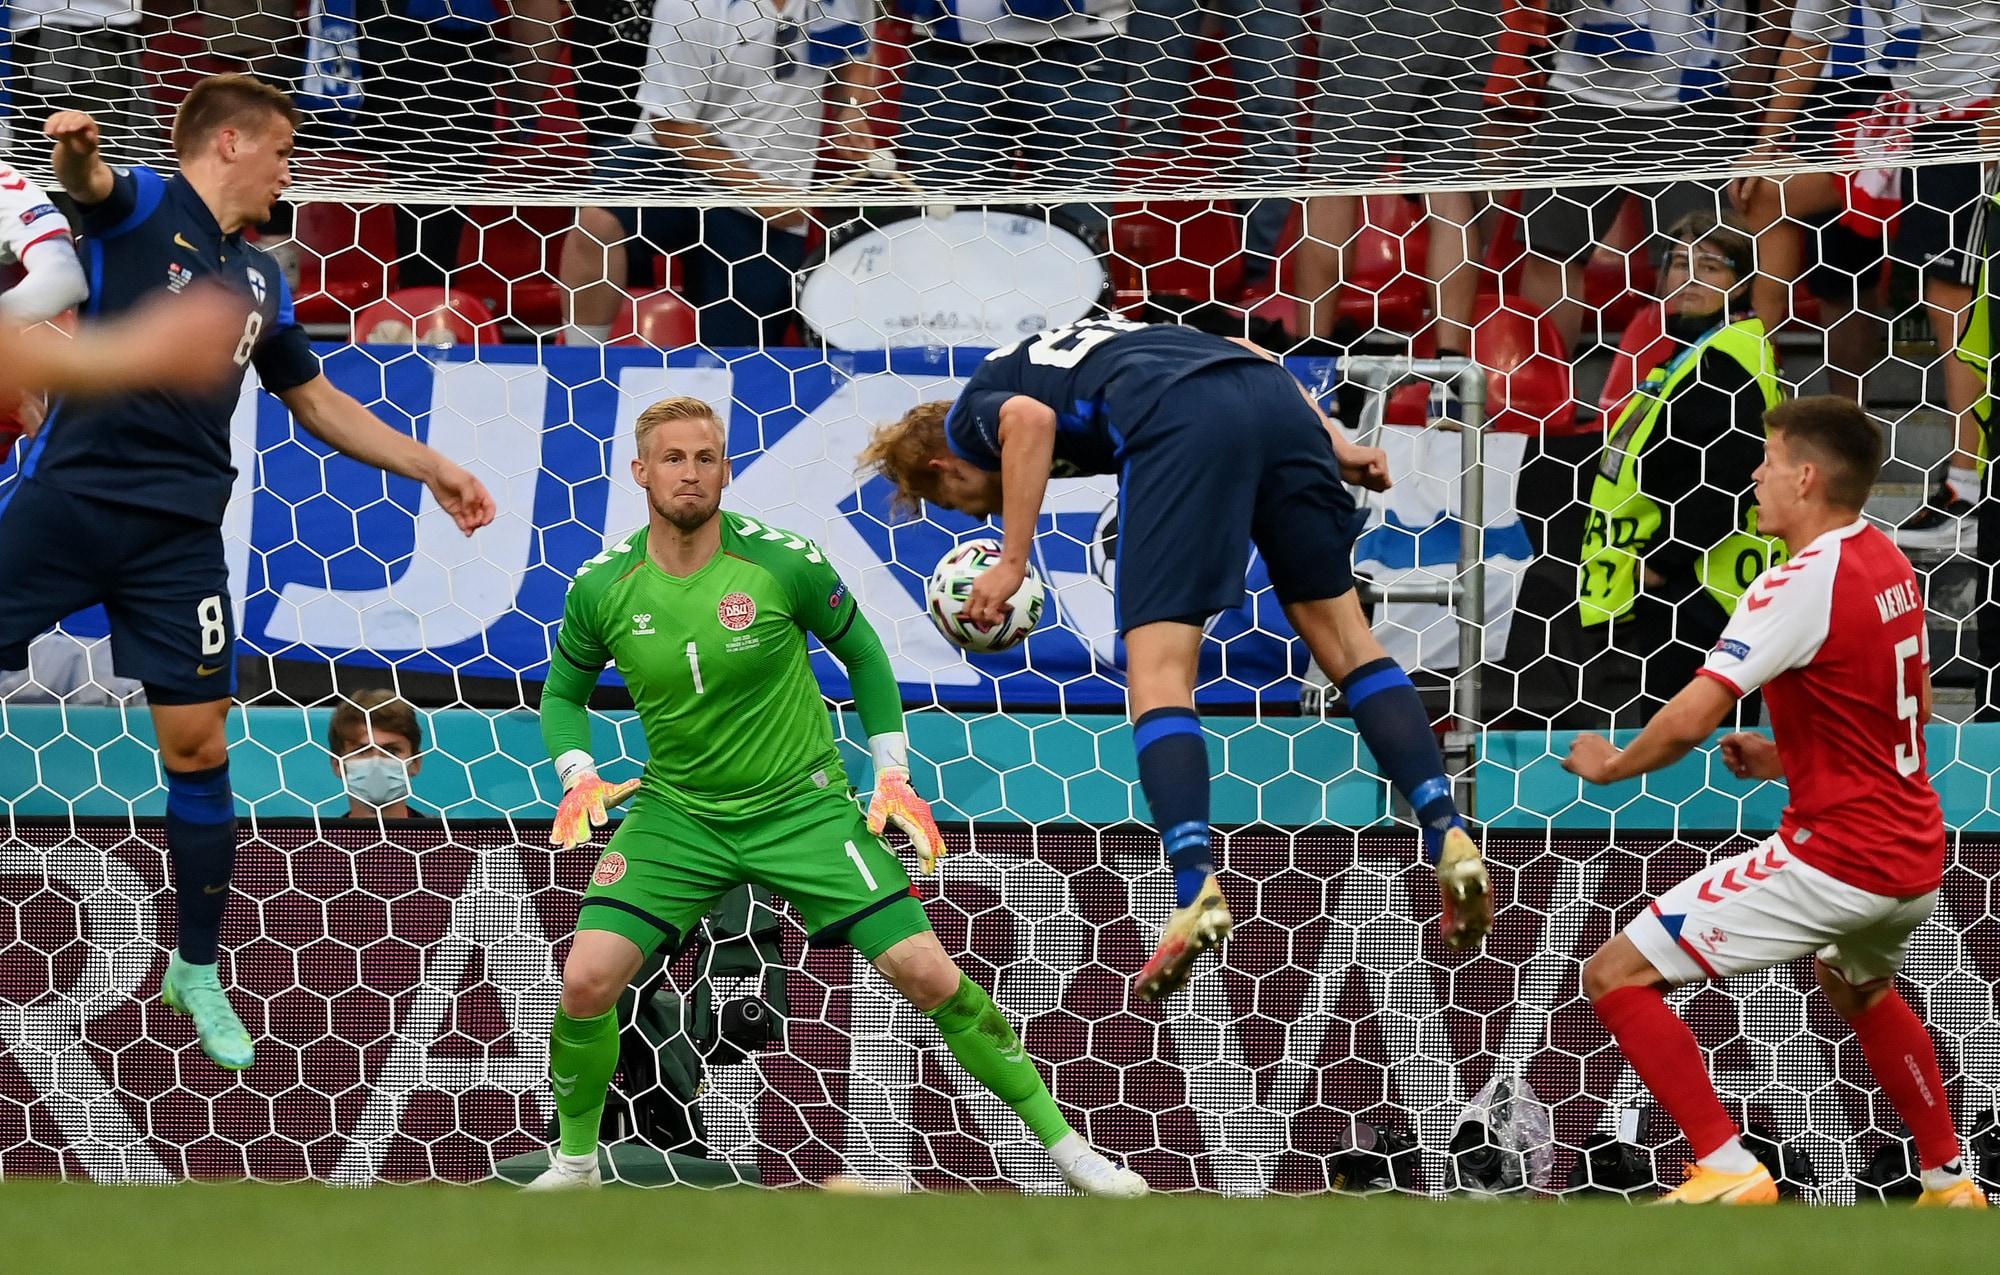 Pohjanpalo gol, Hradecky para tutto: Danimarca ko con la Finlandia